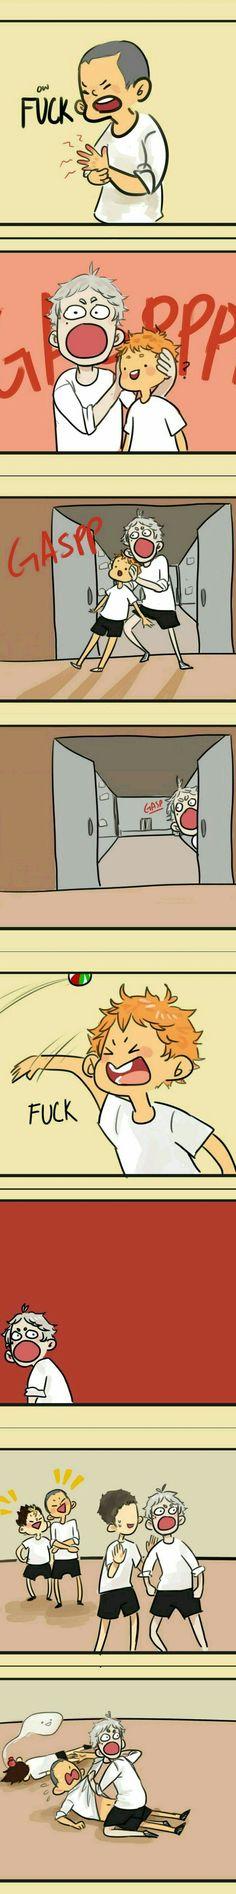 Mom's upset || Tanaka, Sugawara, Hinata, Daichi, Noya || Haikyuu